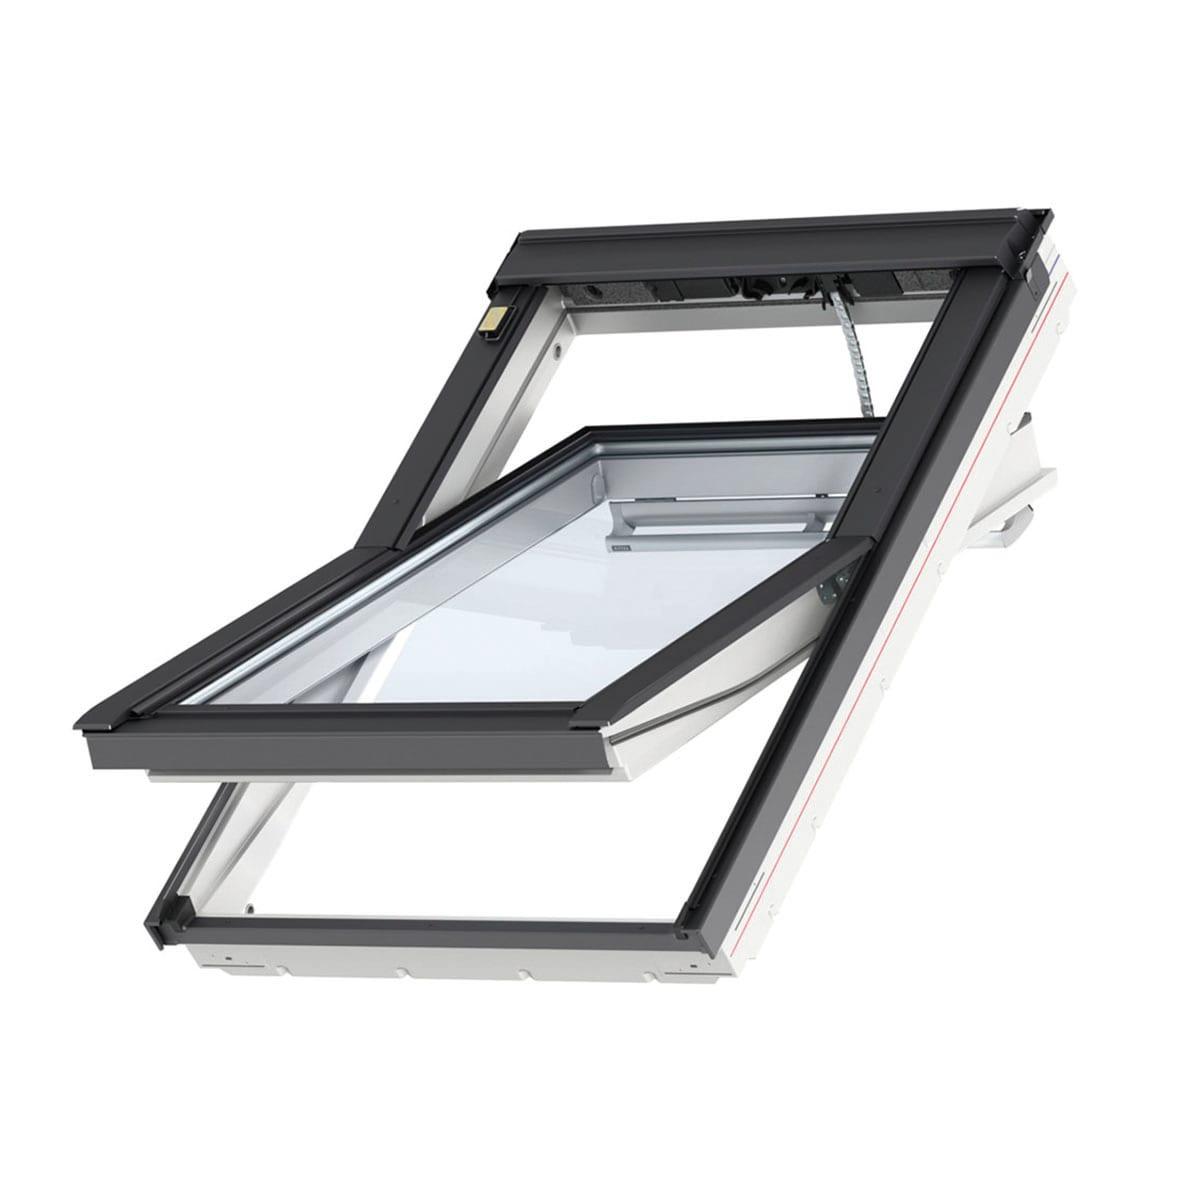 Finestra Oblò Leroy Merlin finestra da tetto (faccia inclinata) velux ggu mk08 008621 elettrico l 78 x  h 140 cm bianco